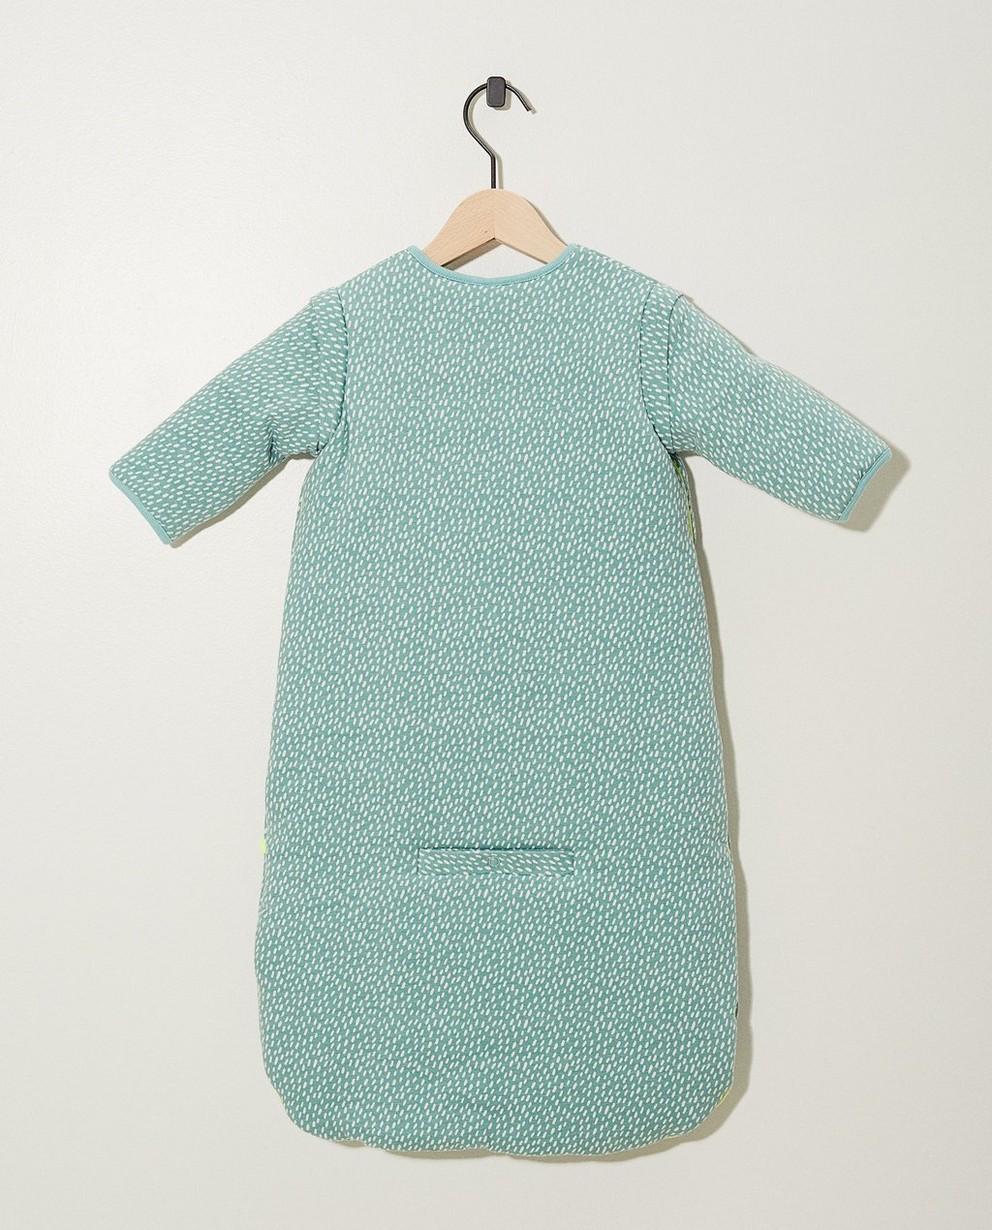 Babyspulletjes - BLM -